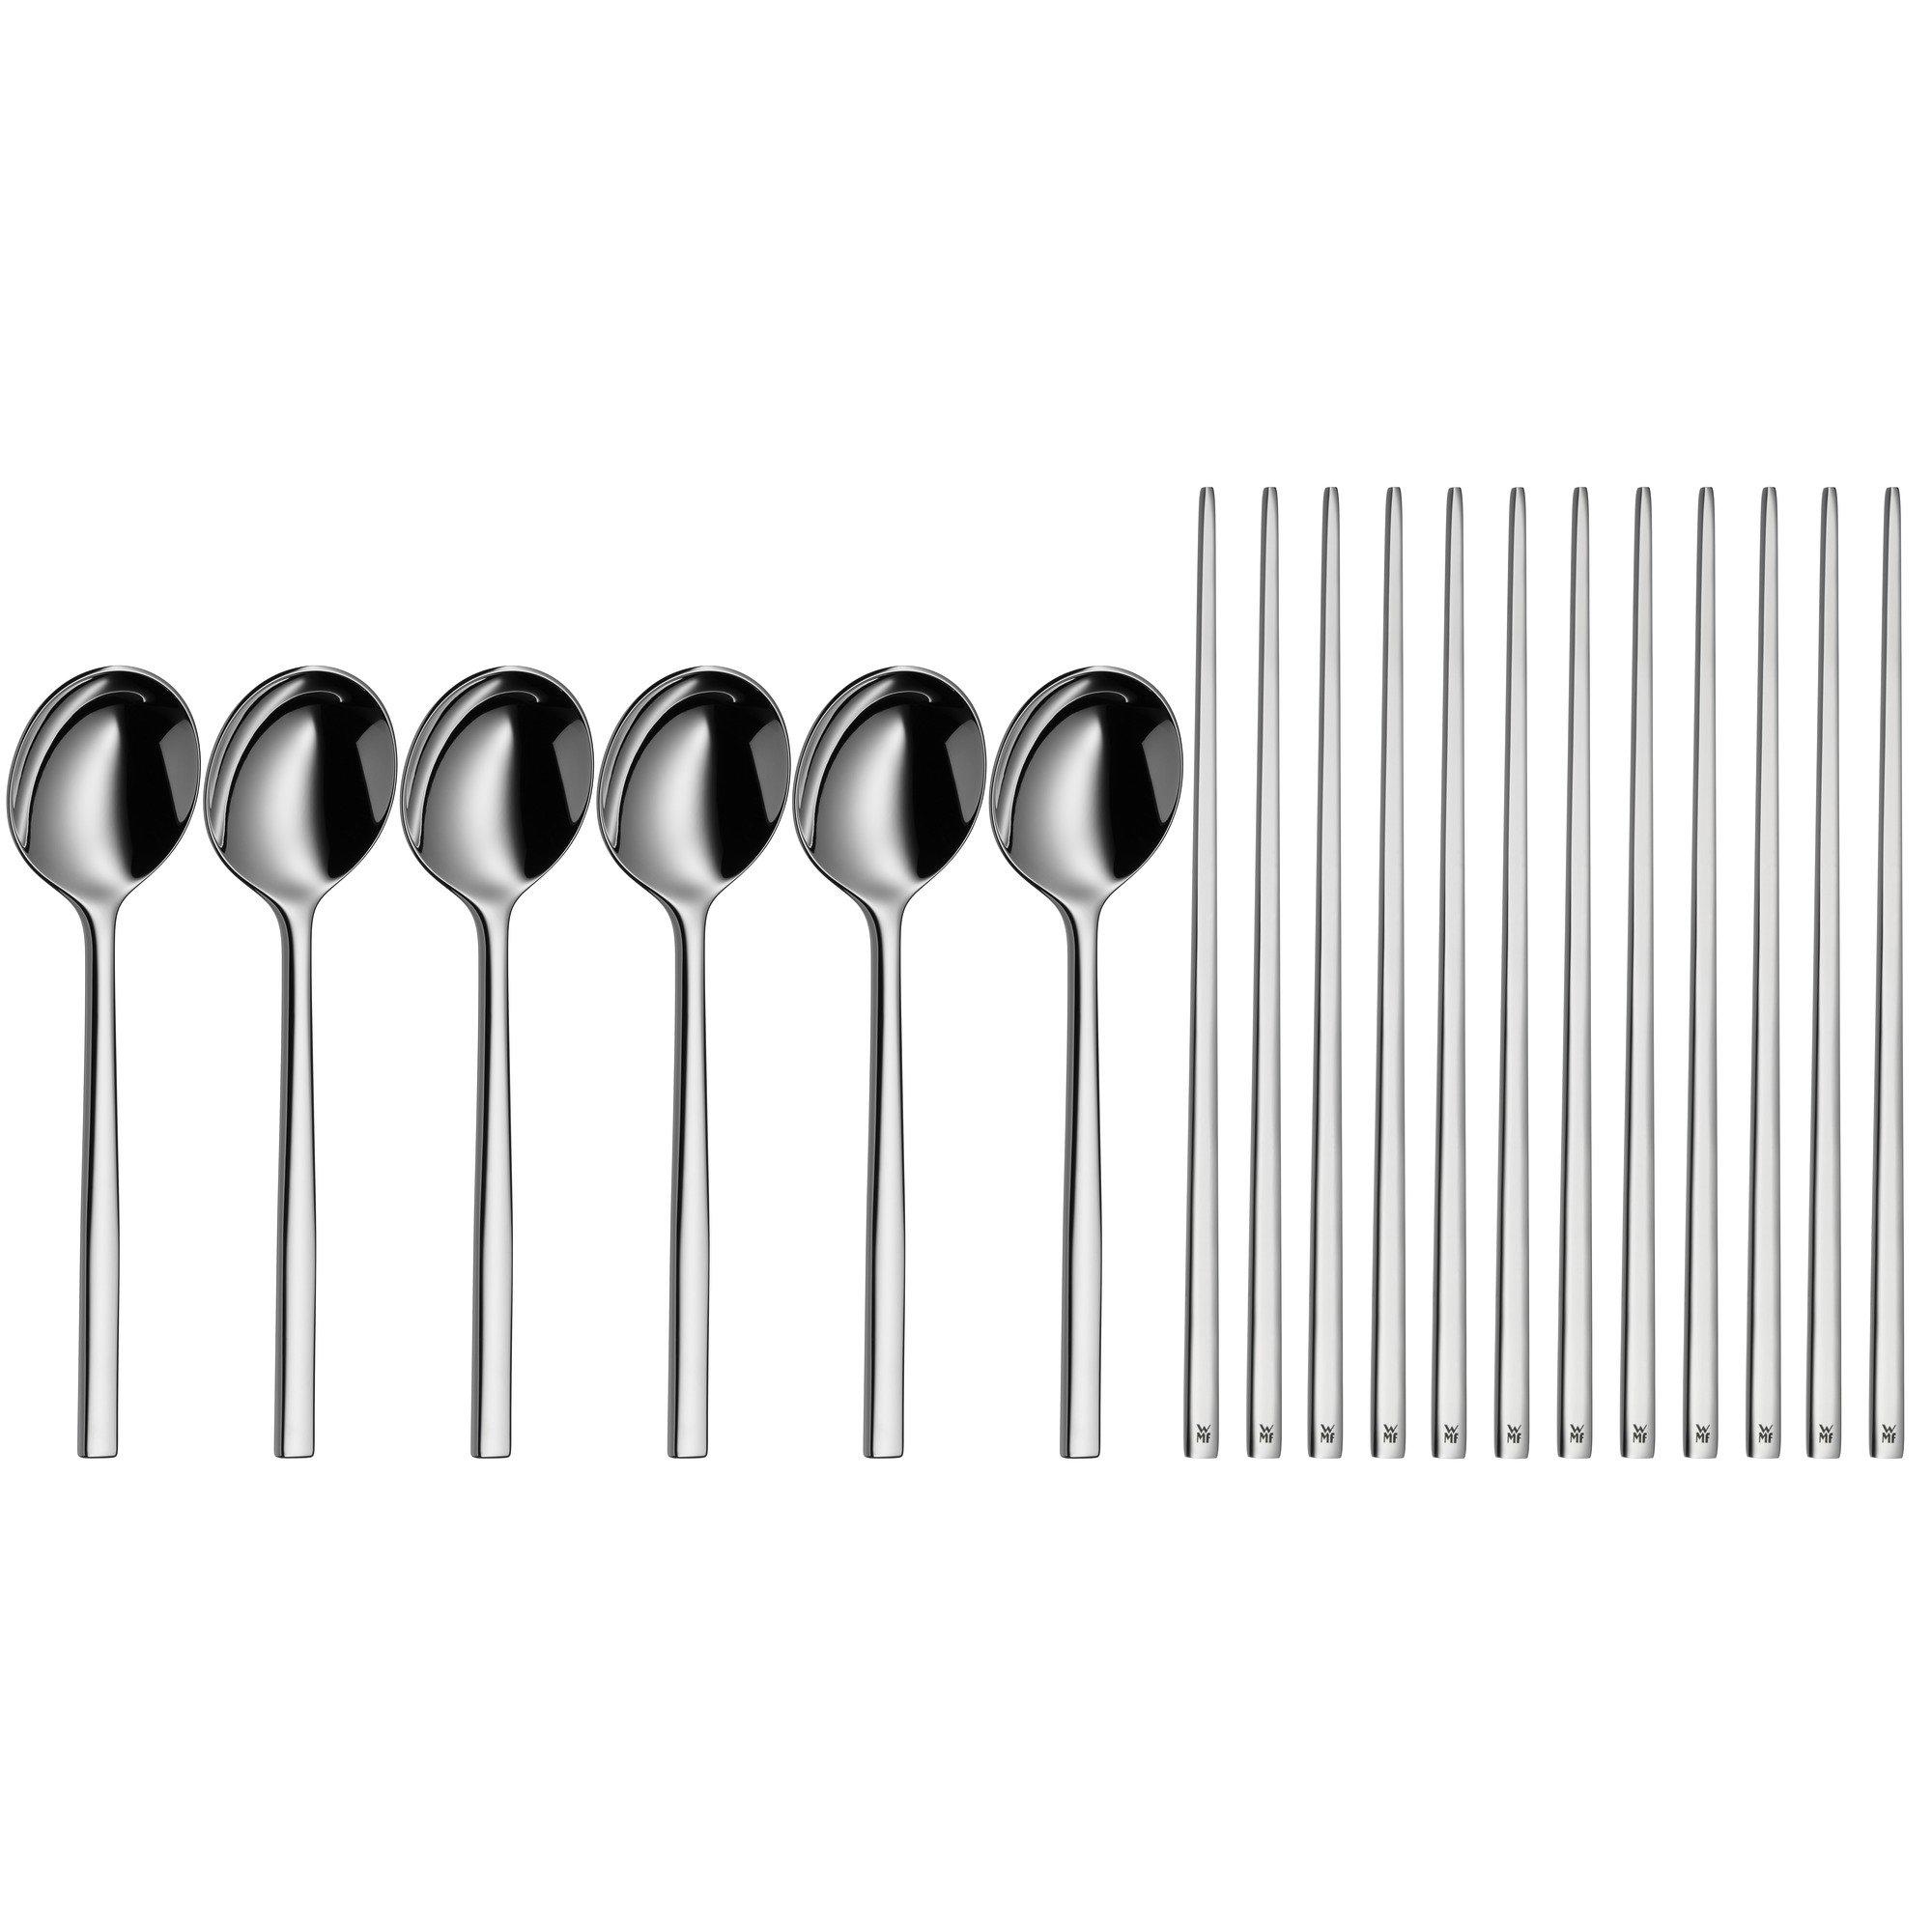 WMF 1294036040 Chopsticks Set of 12